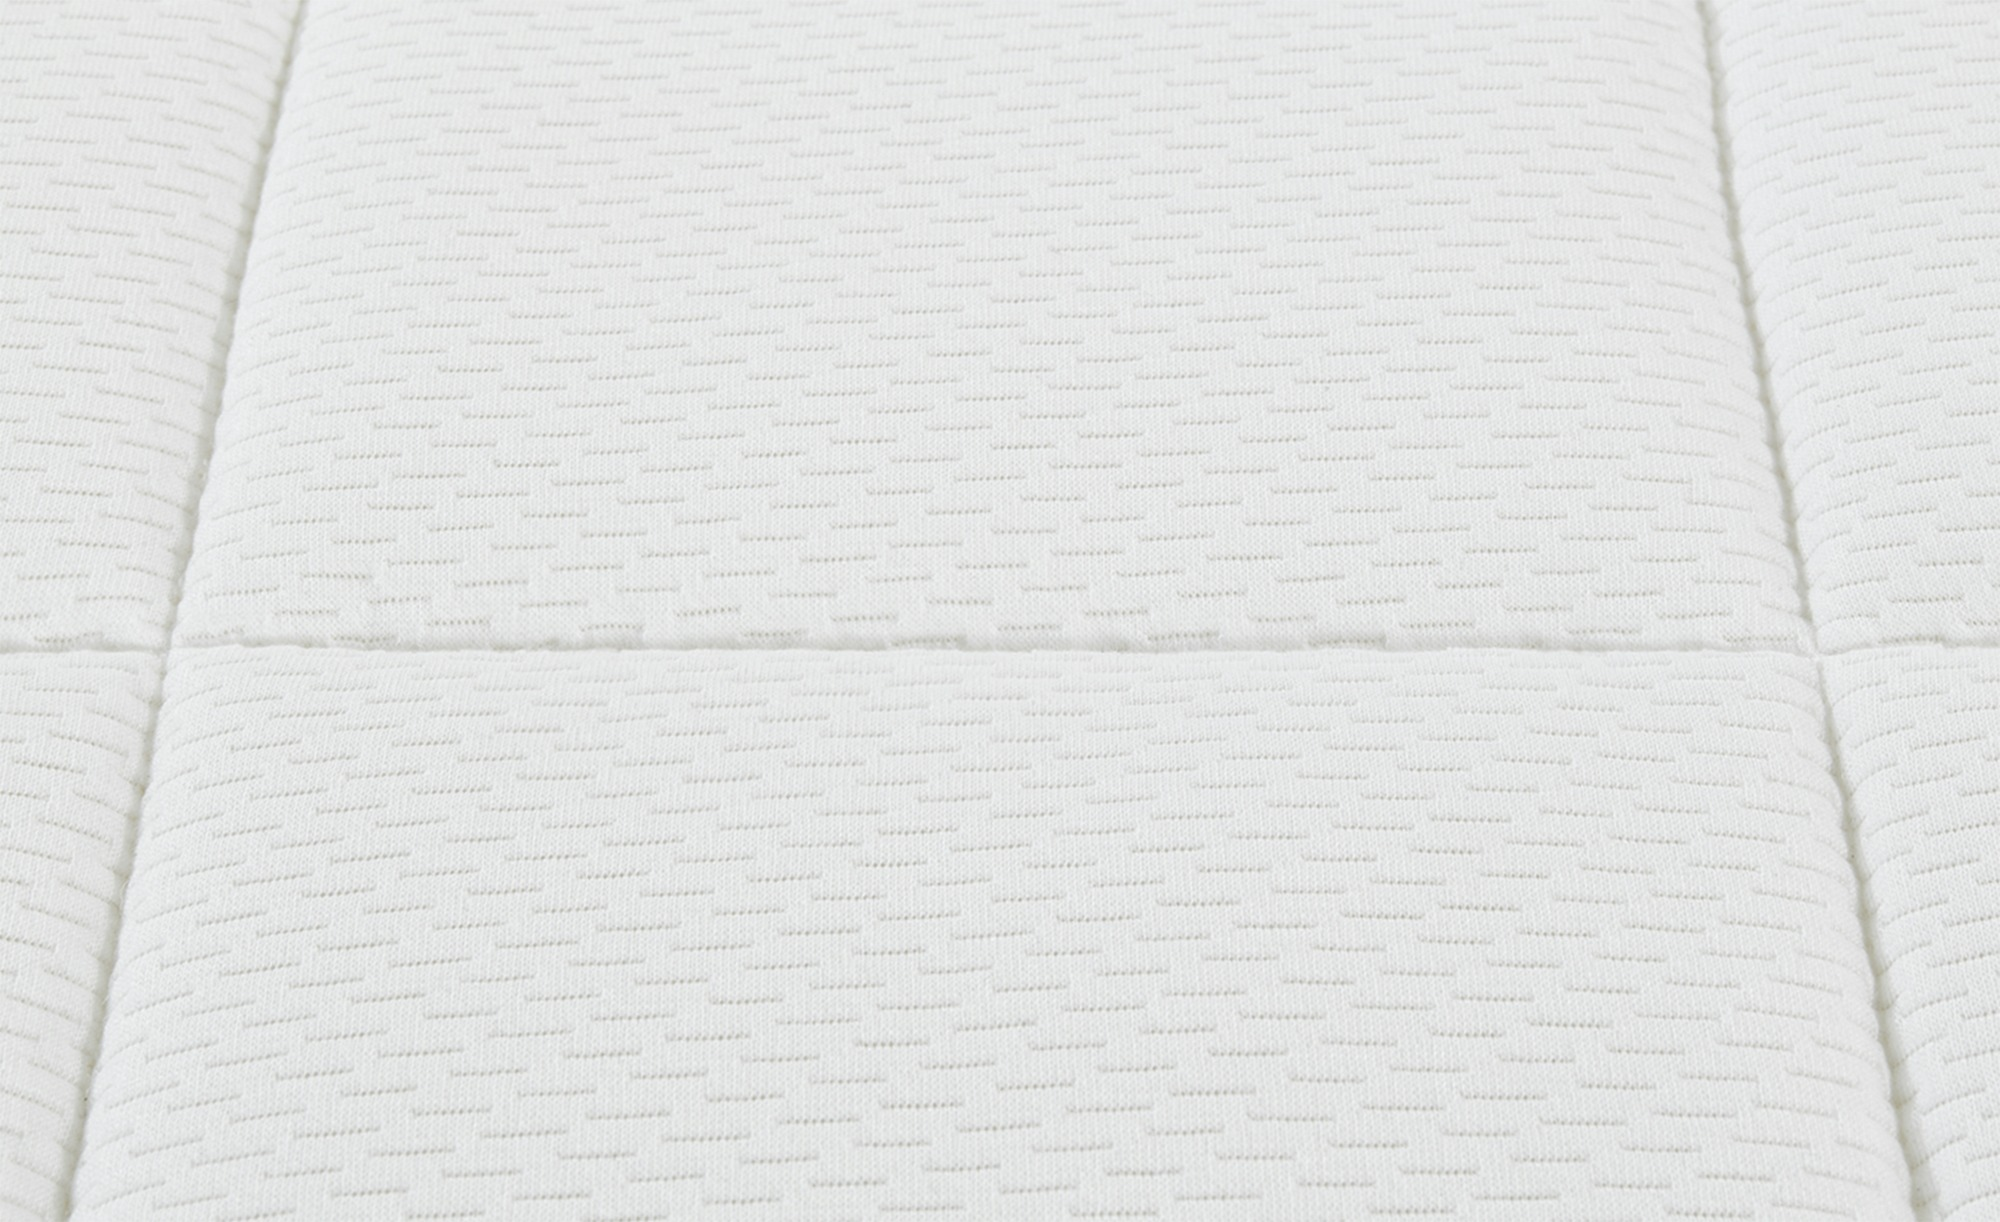 Westerburg Boxspringbett 140x200 - beige - Buche Ligno BX ¦ beige ¦ Maße (cm): B: 153 H: 125 T: 208 Betten > Boxspringbetten > Boxspringbetten 140x200 - Höffner